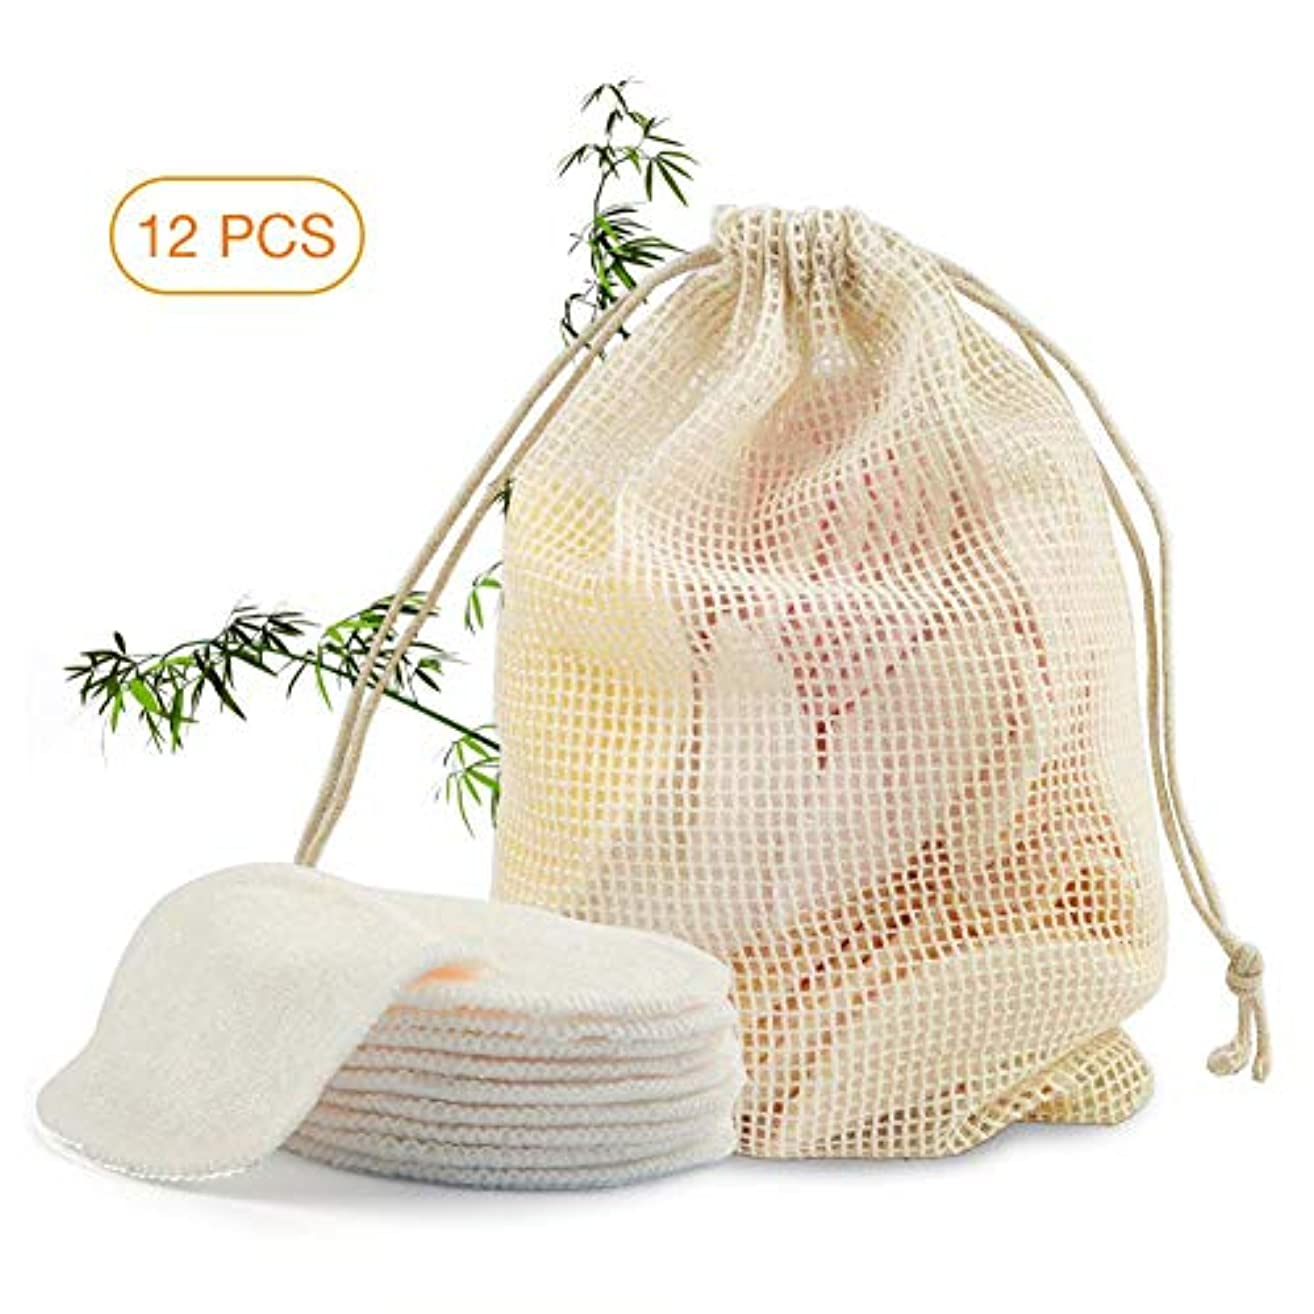 Coldwhite 12ピース化粧落としパッド竹繊維化粧落とし洗える化粧コットン8センチ直径2層でコットンメッシュバッグ付き洗顔スキンクリーニング